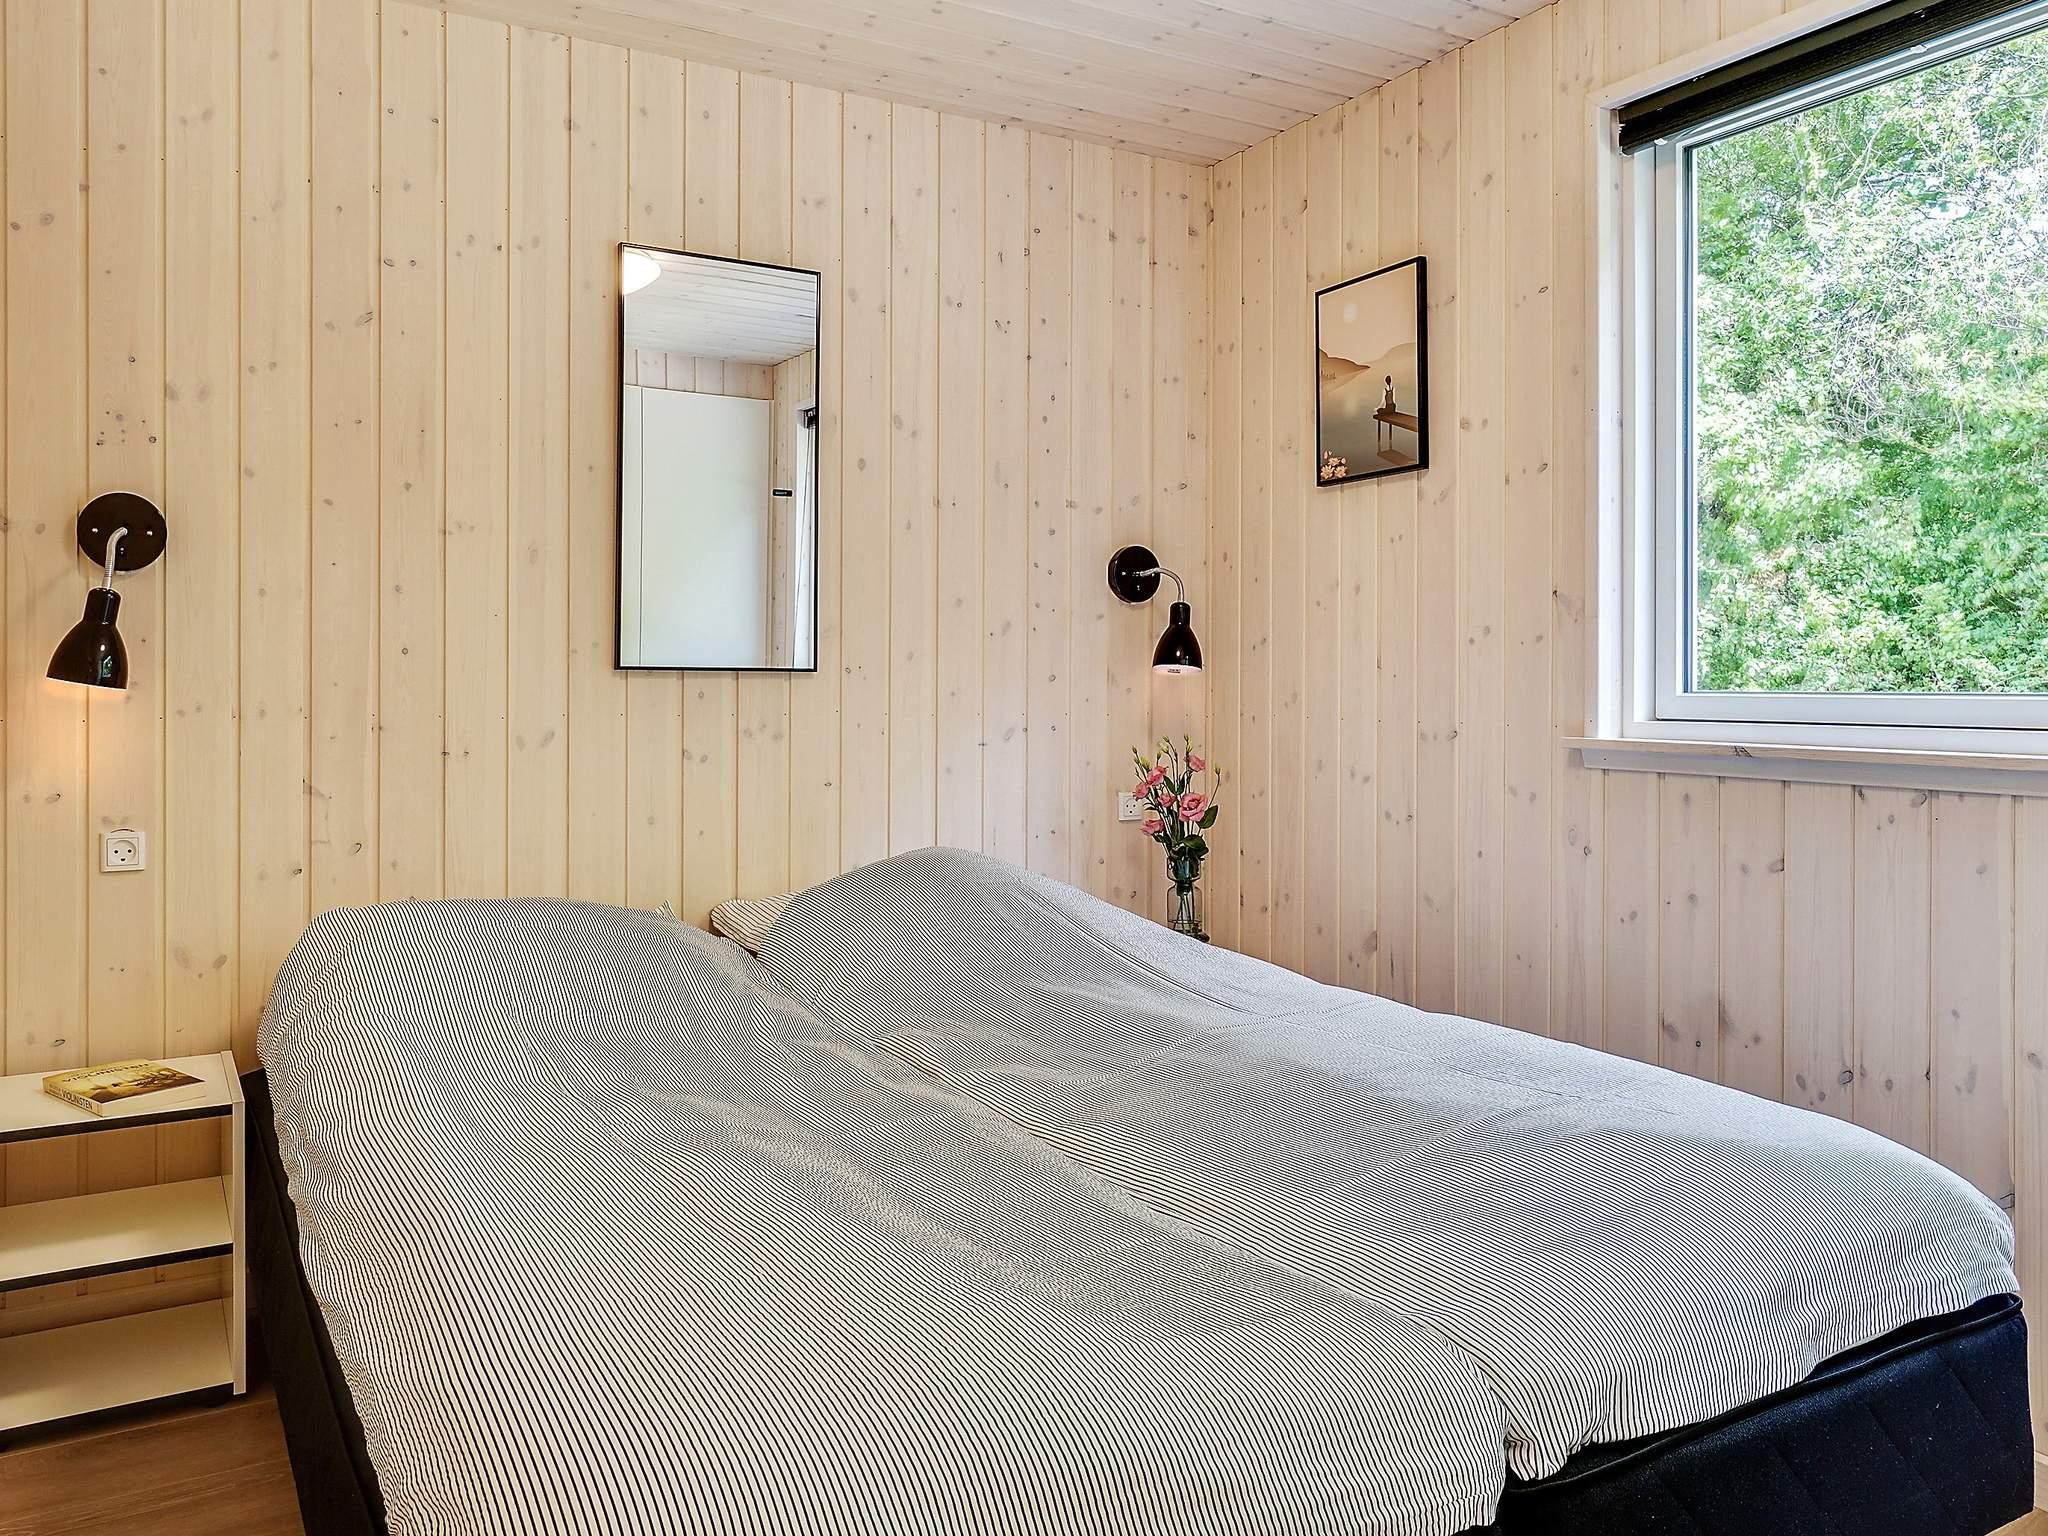 Ferienhaus Vejby Strand (2354752), Vejby, , Nordseeland, Dänemark, Bild 8